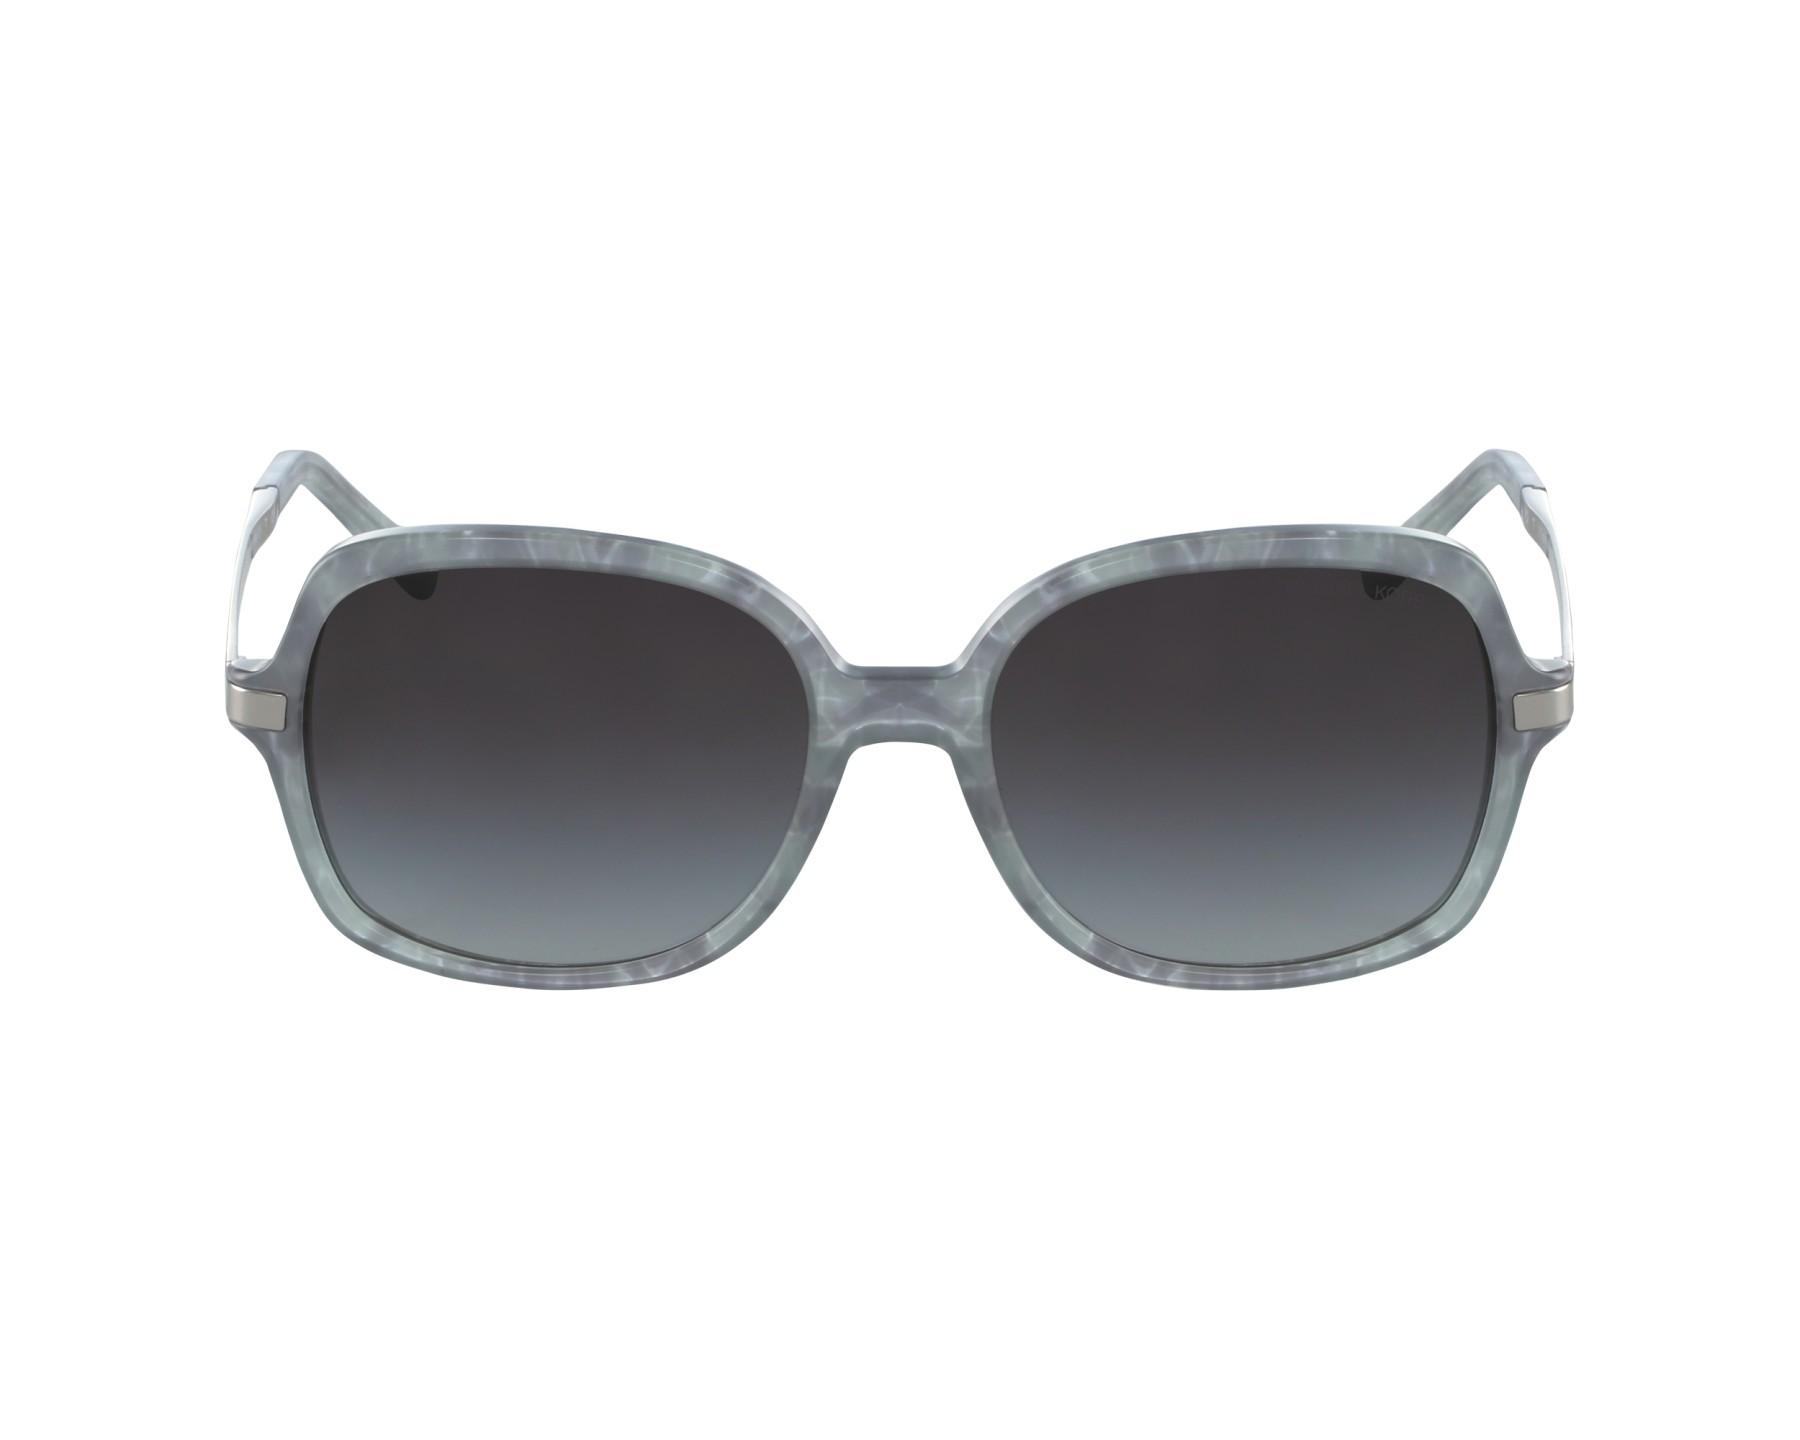 020e97615c Michael Kors Sunglasses Adrianna Ii